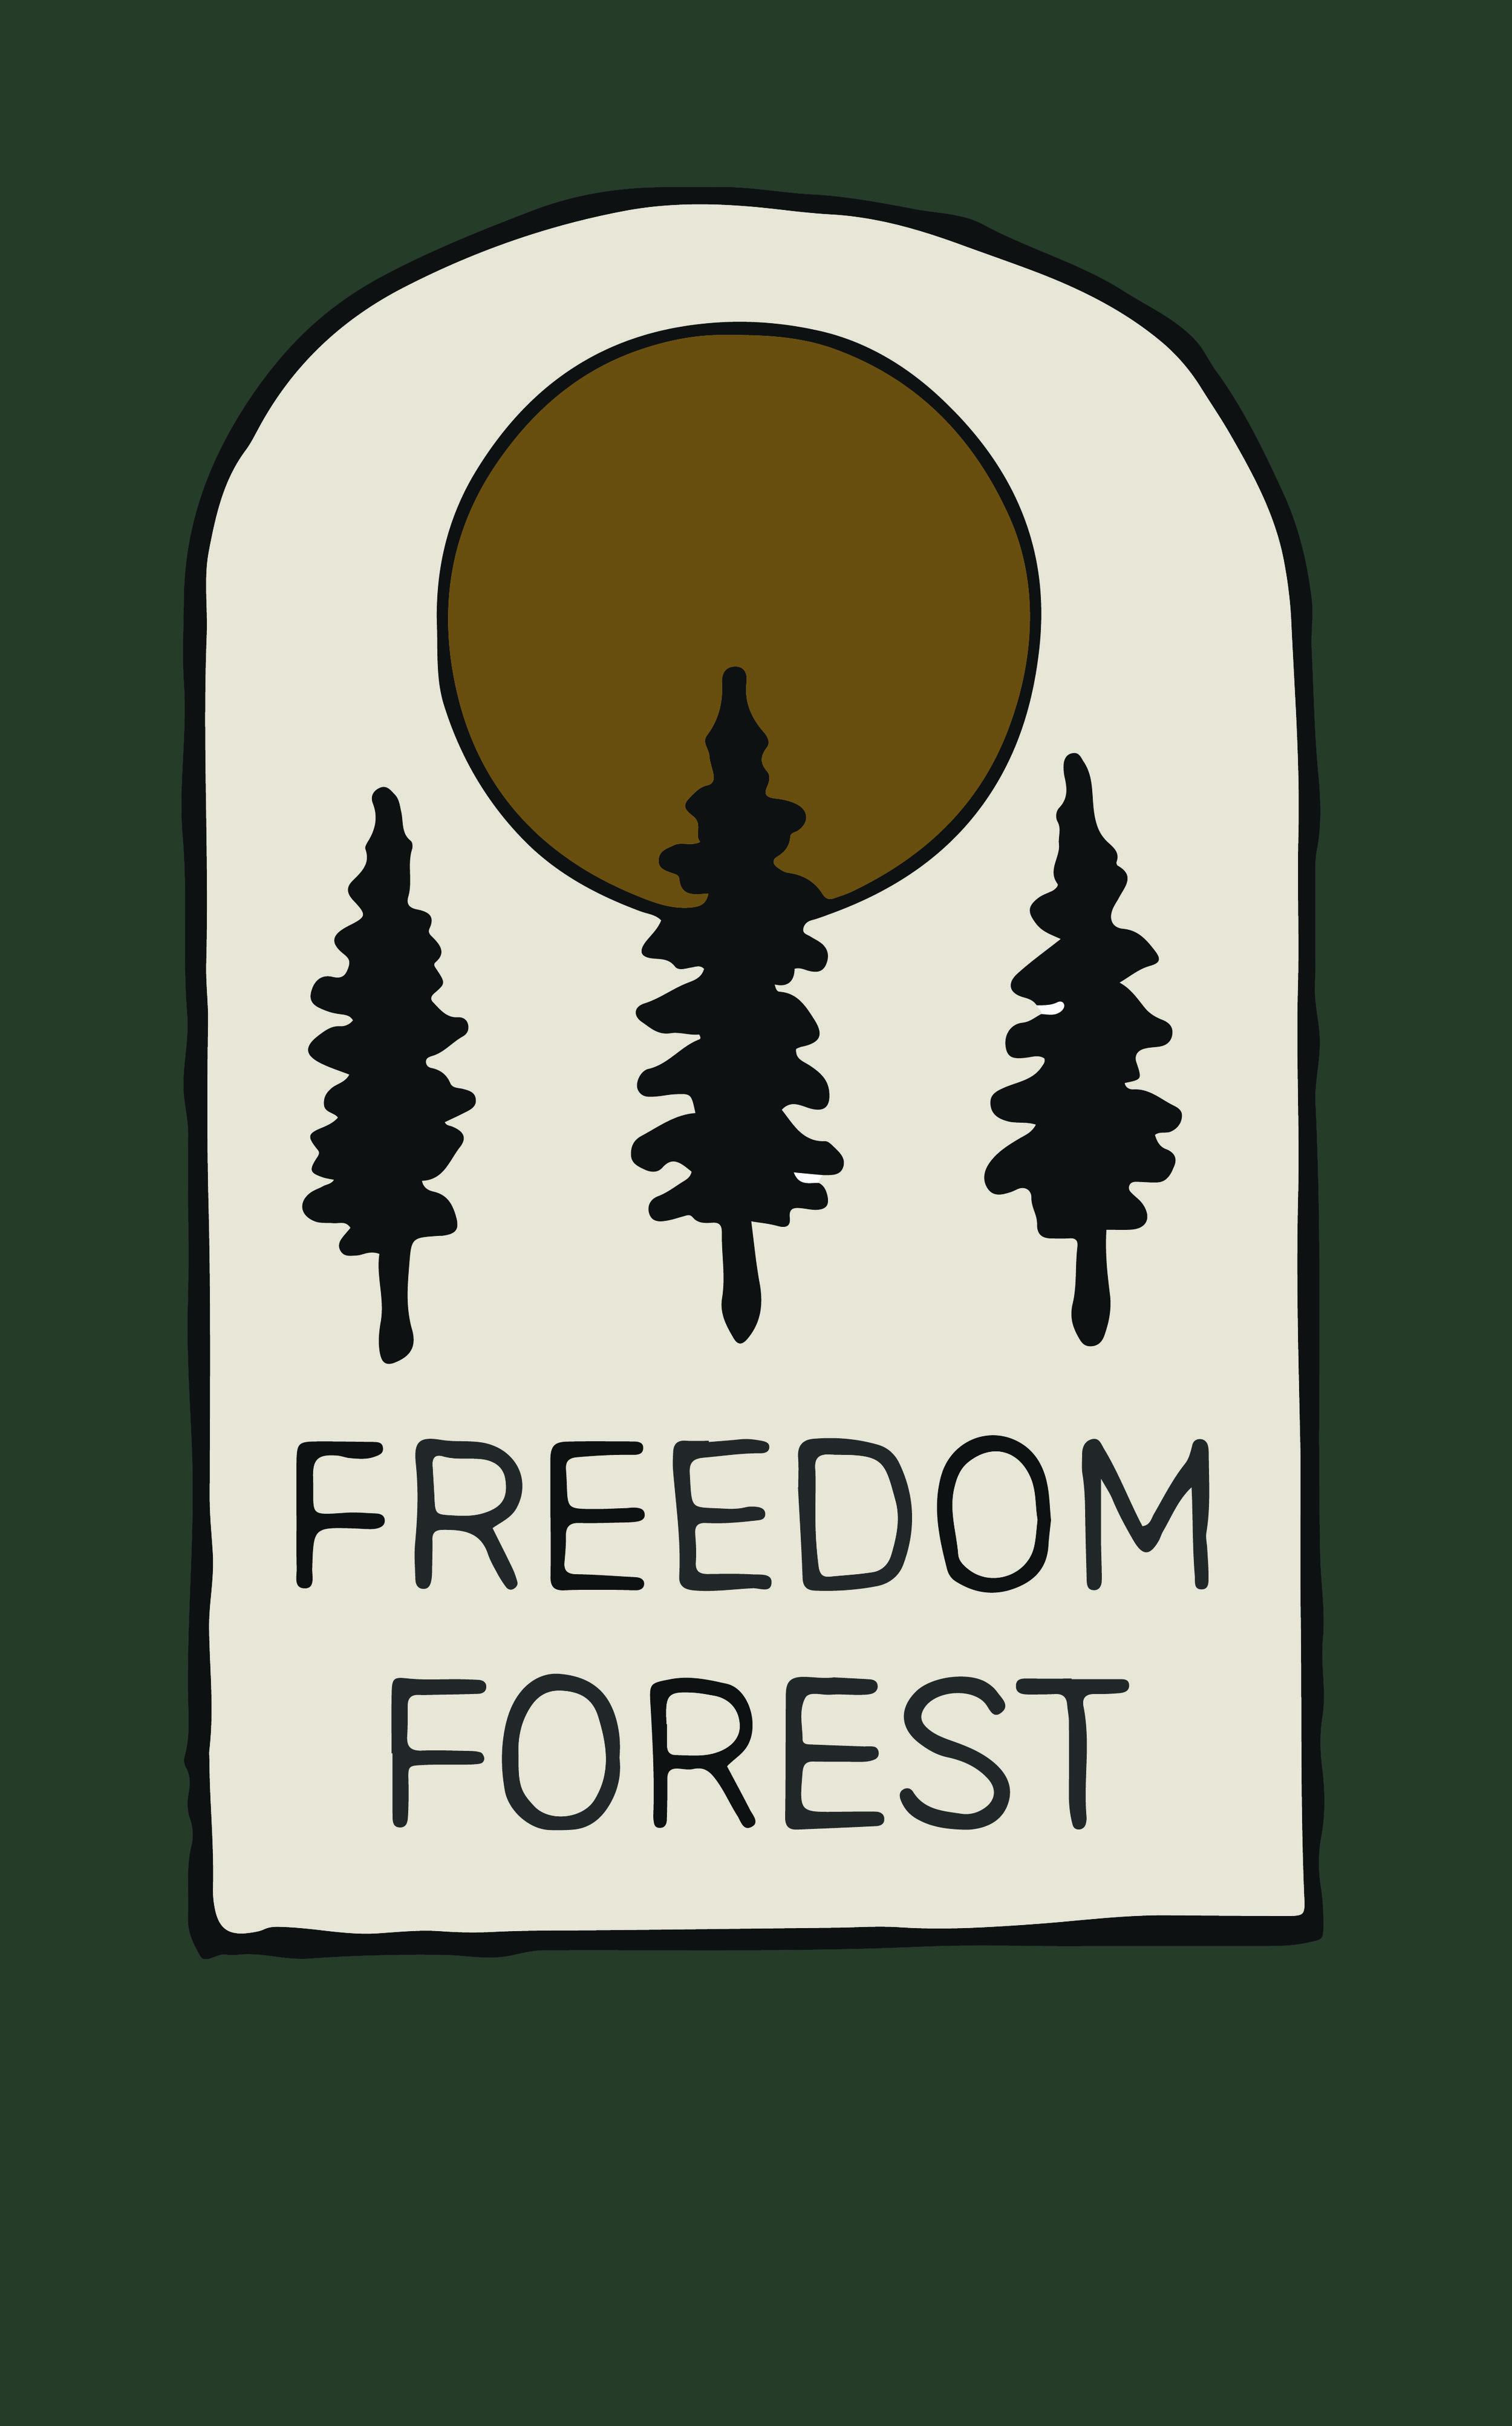 FreedomForest-03.jpg